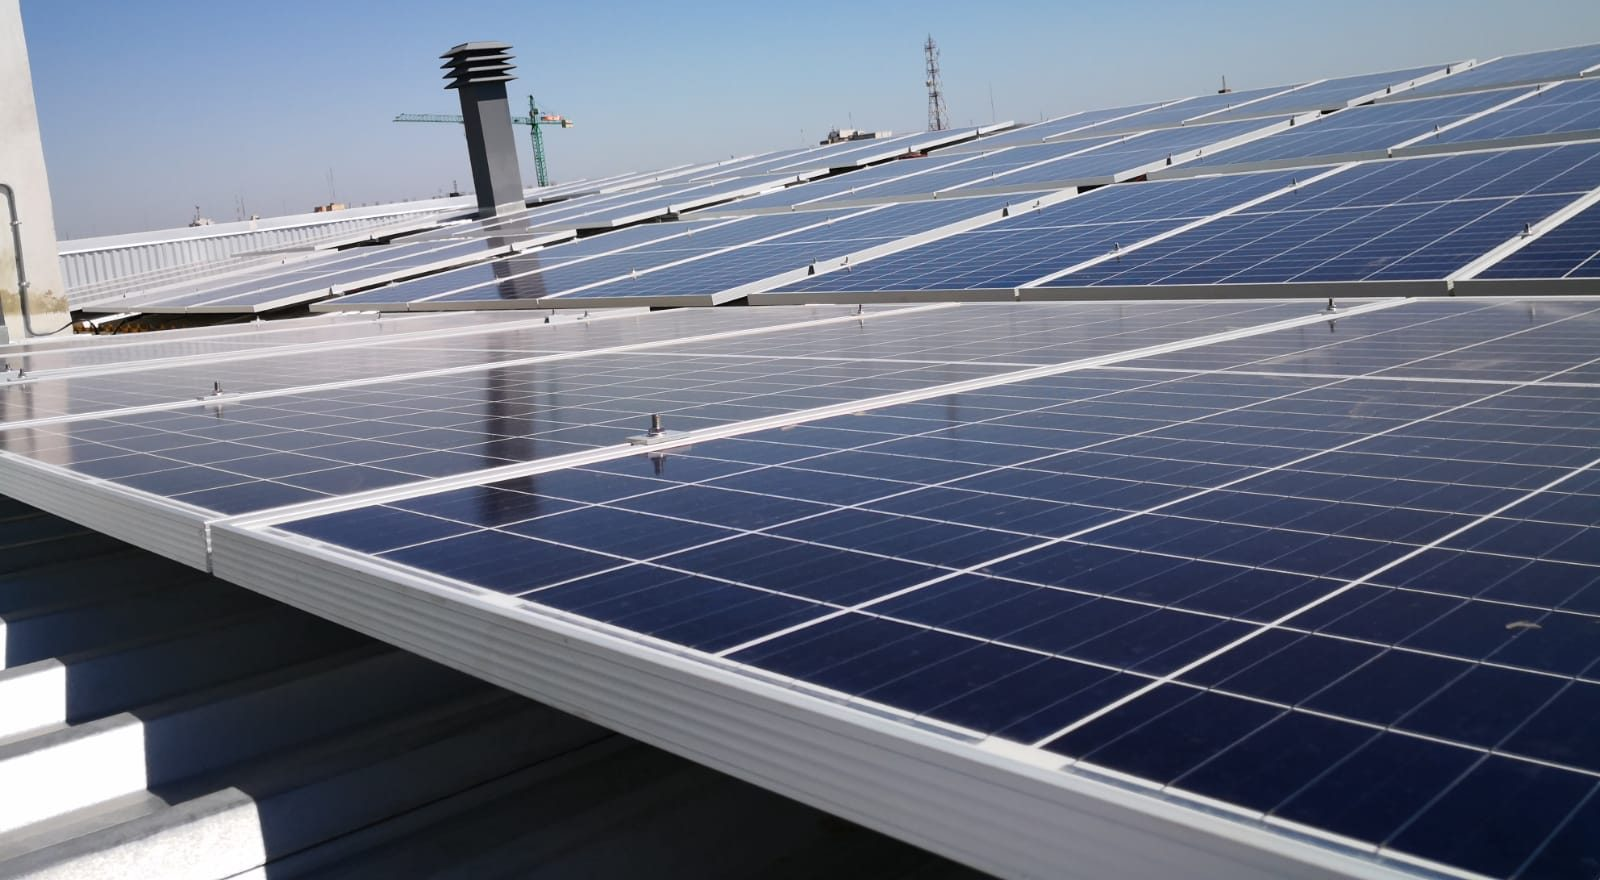 Paneles solares en Fortaleza 25 de mayo